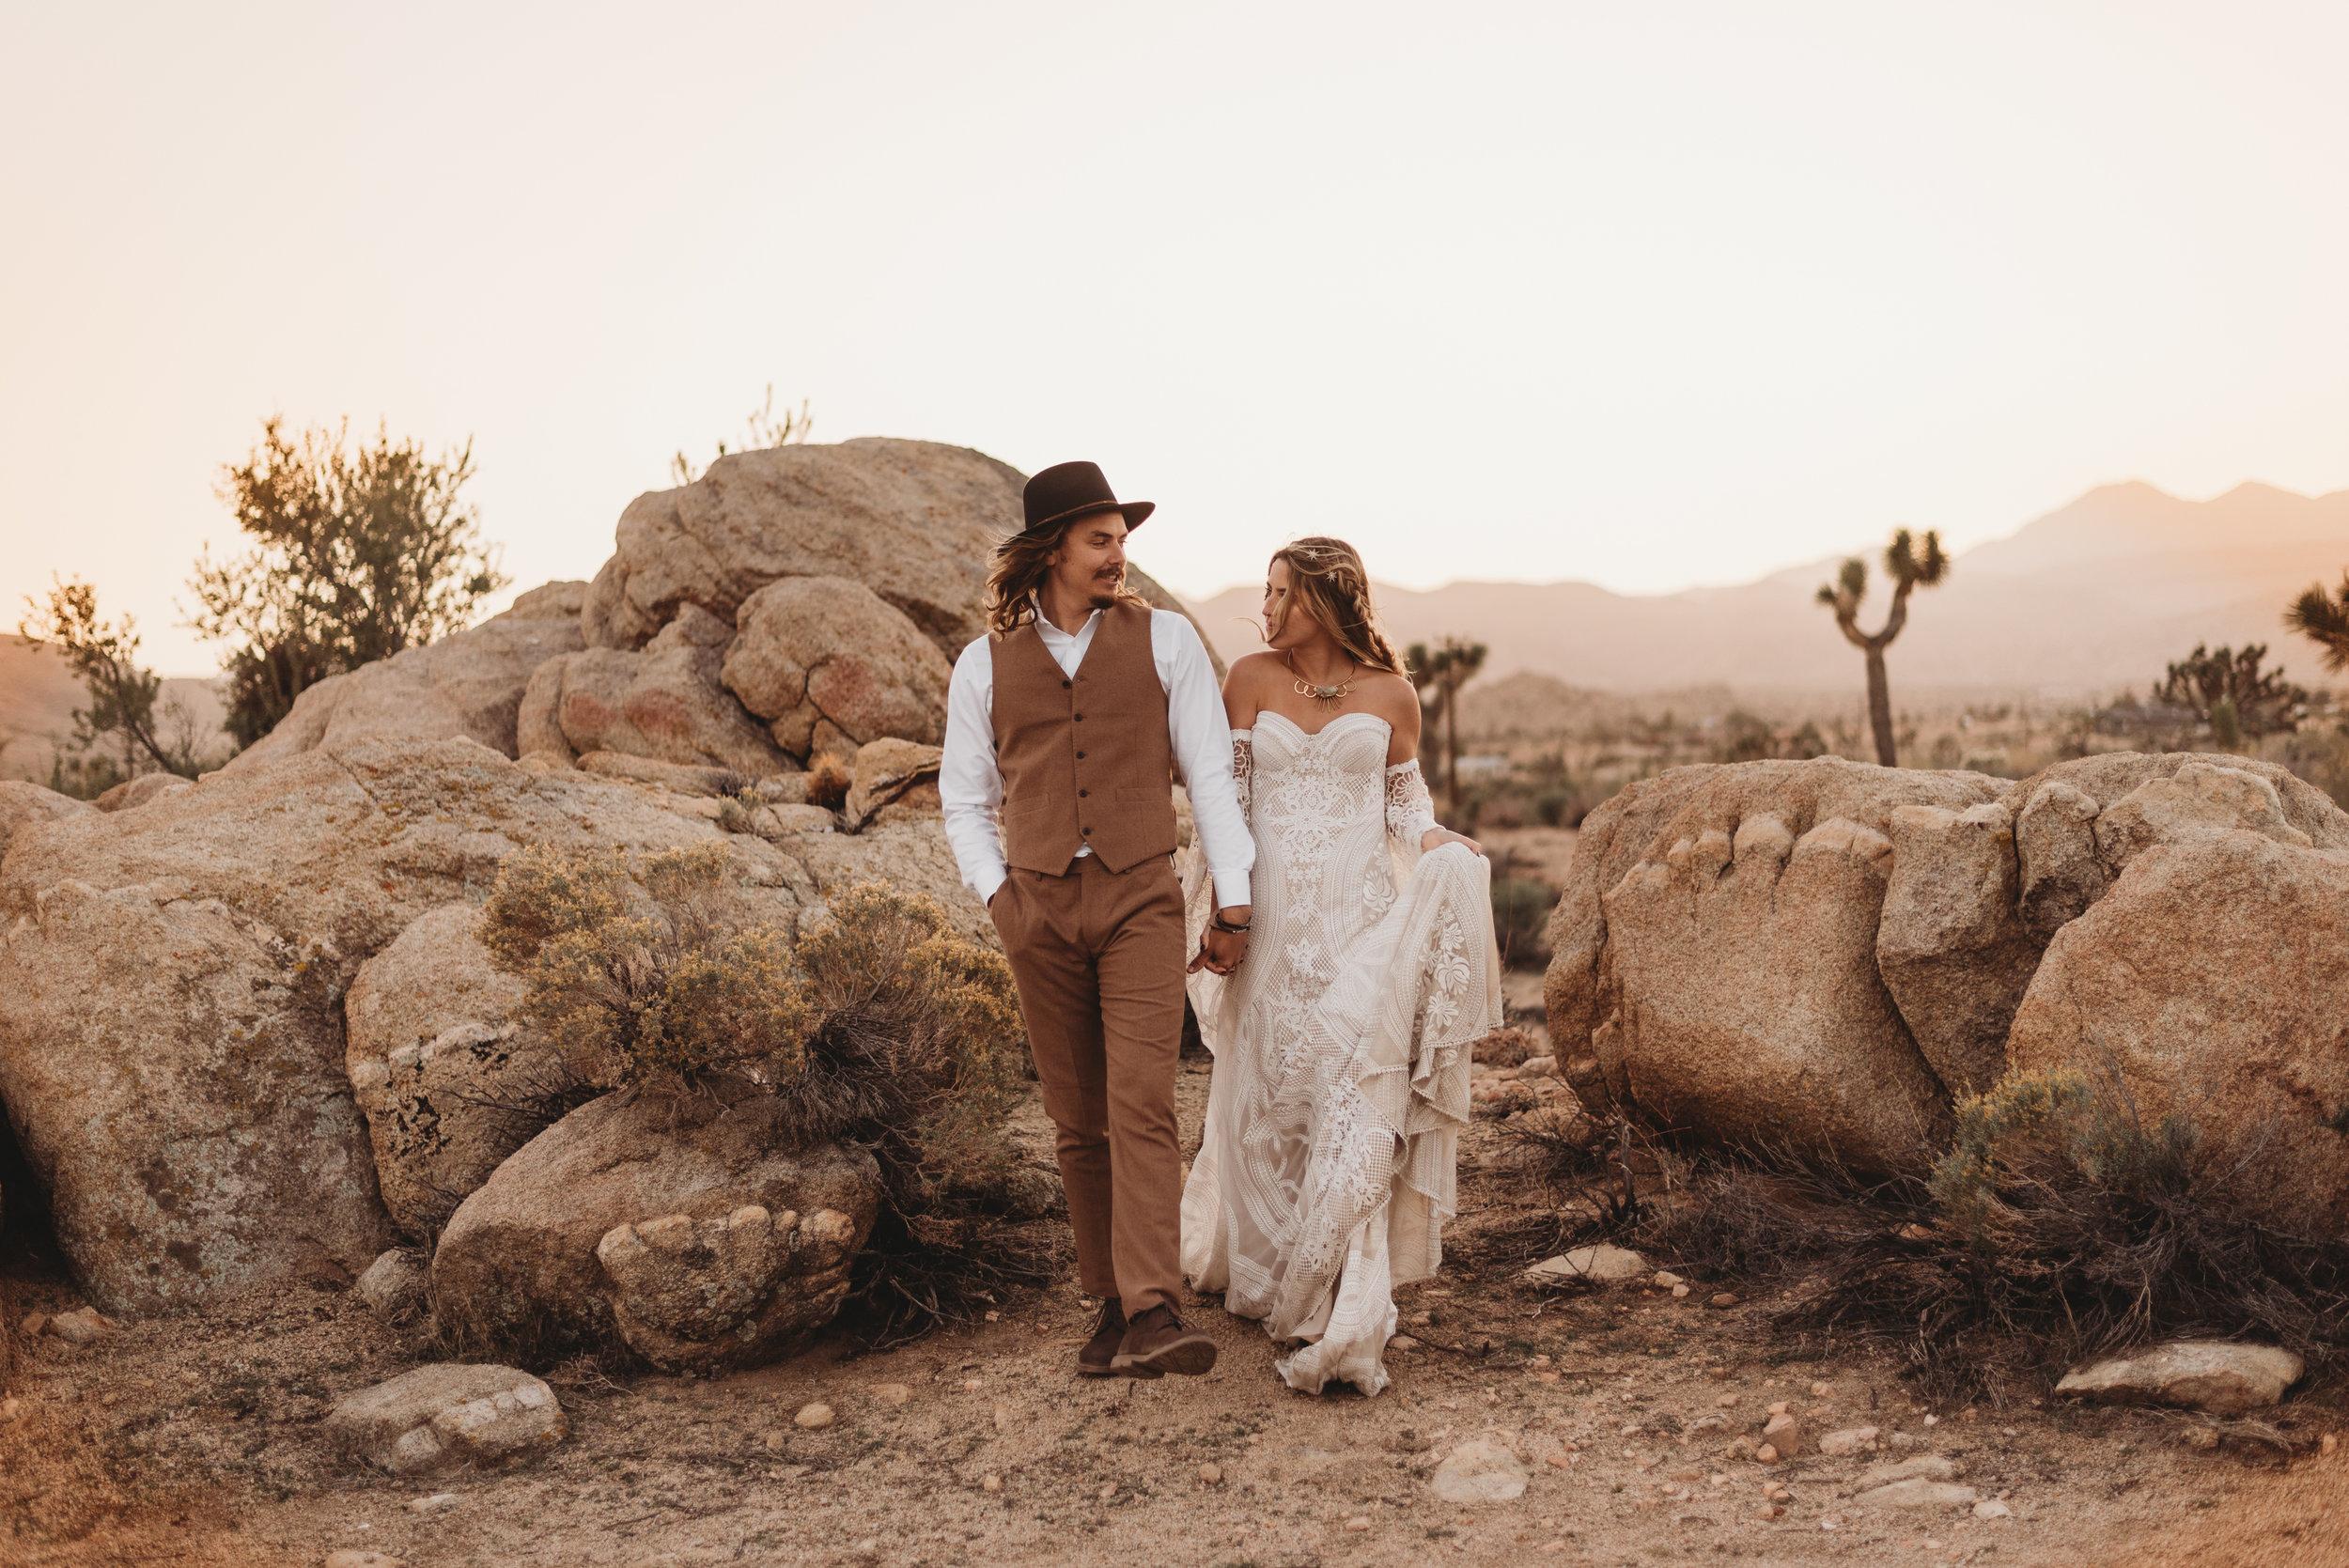 FortSt.John_photographer_TyraEPhotography_Wedding_Couple_Family_Photograhy_DawsonCreek_Elopement_Bride_Boduoir_Portraits-8714.jpg